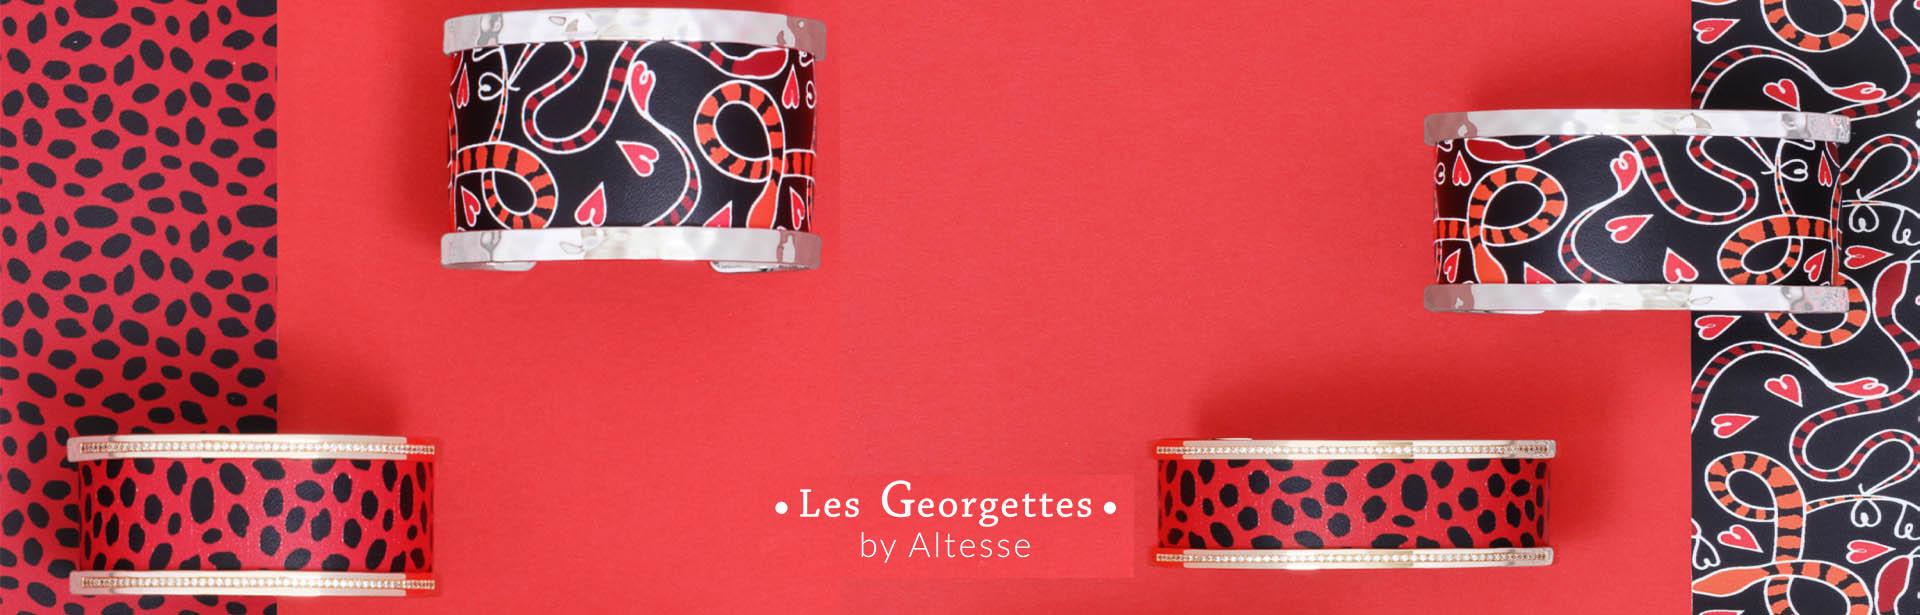 LesGeorgettes-Start-Kopie